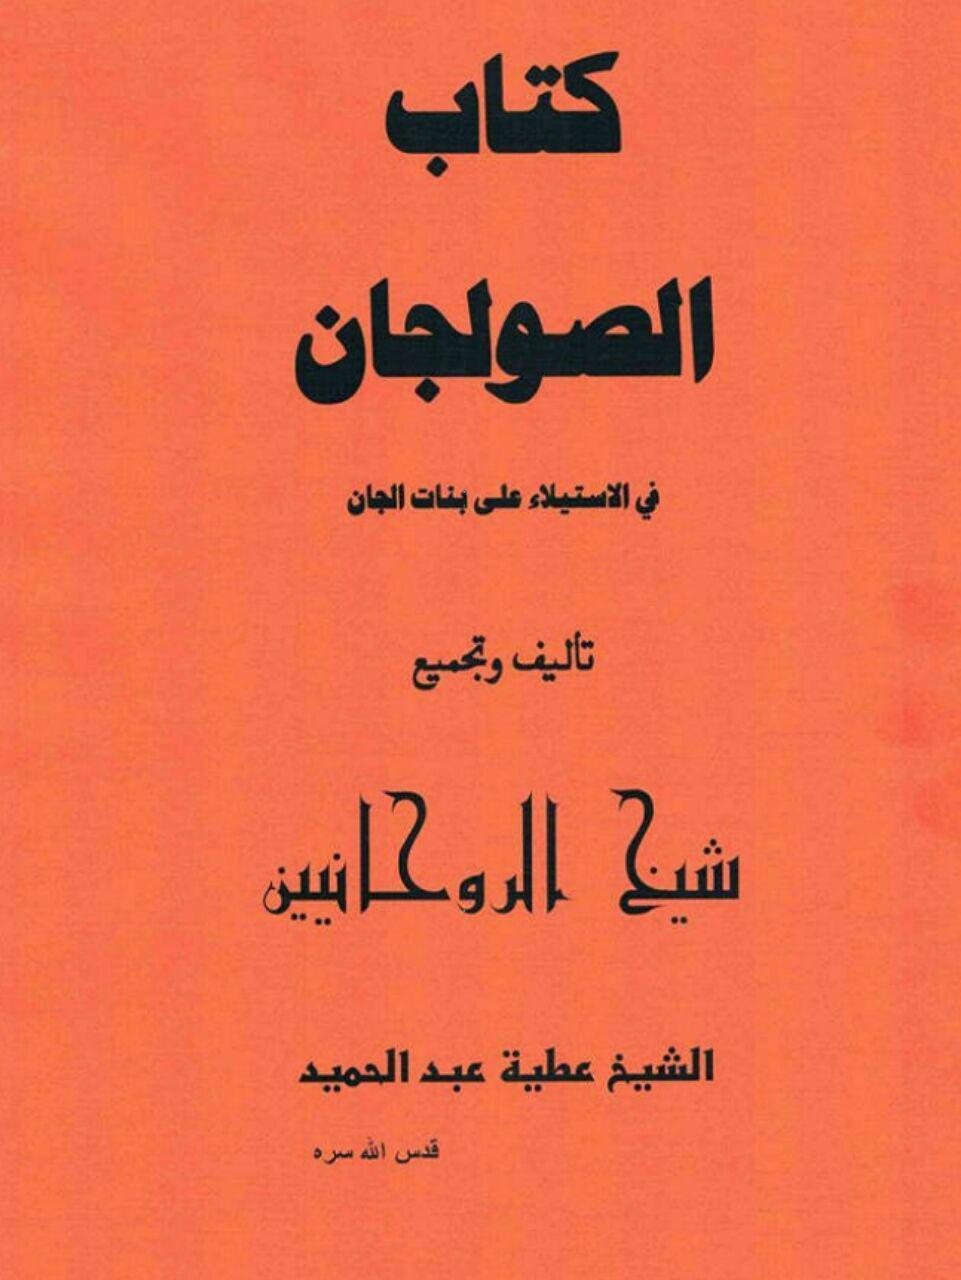 کتاب ارزشمند و نایاب الصولجان